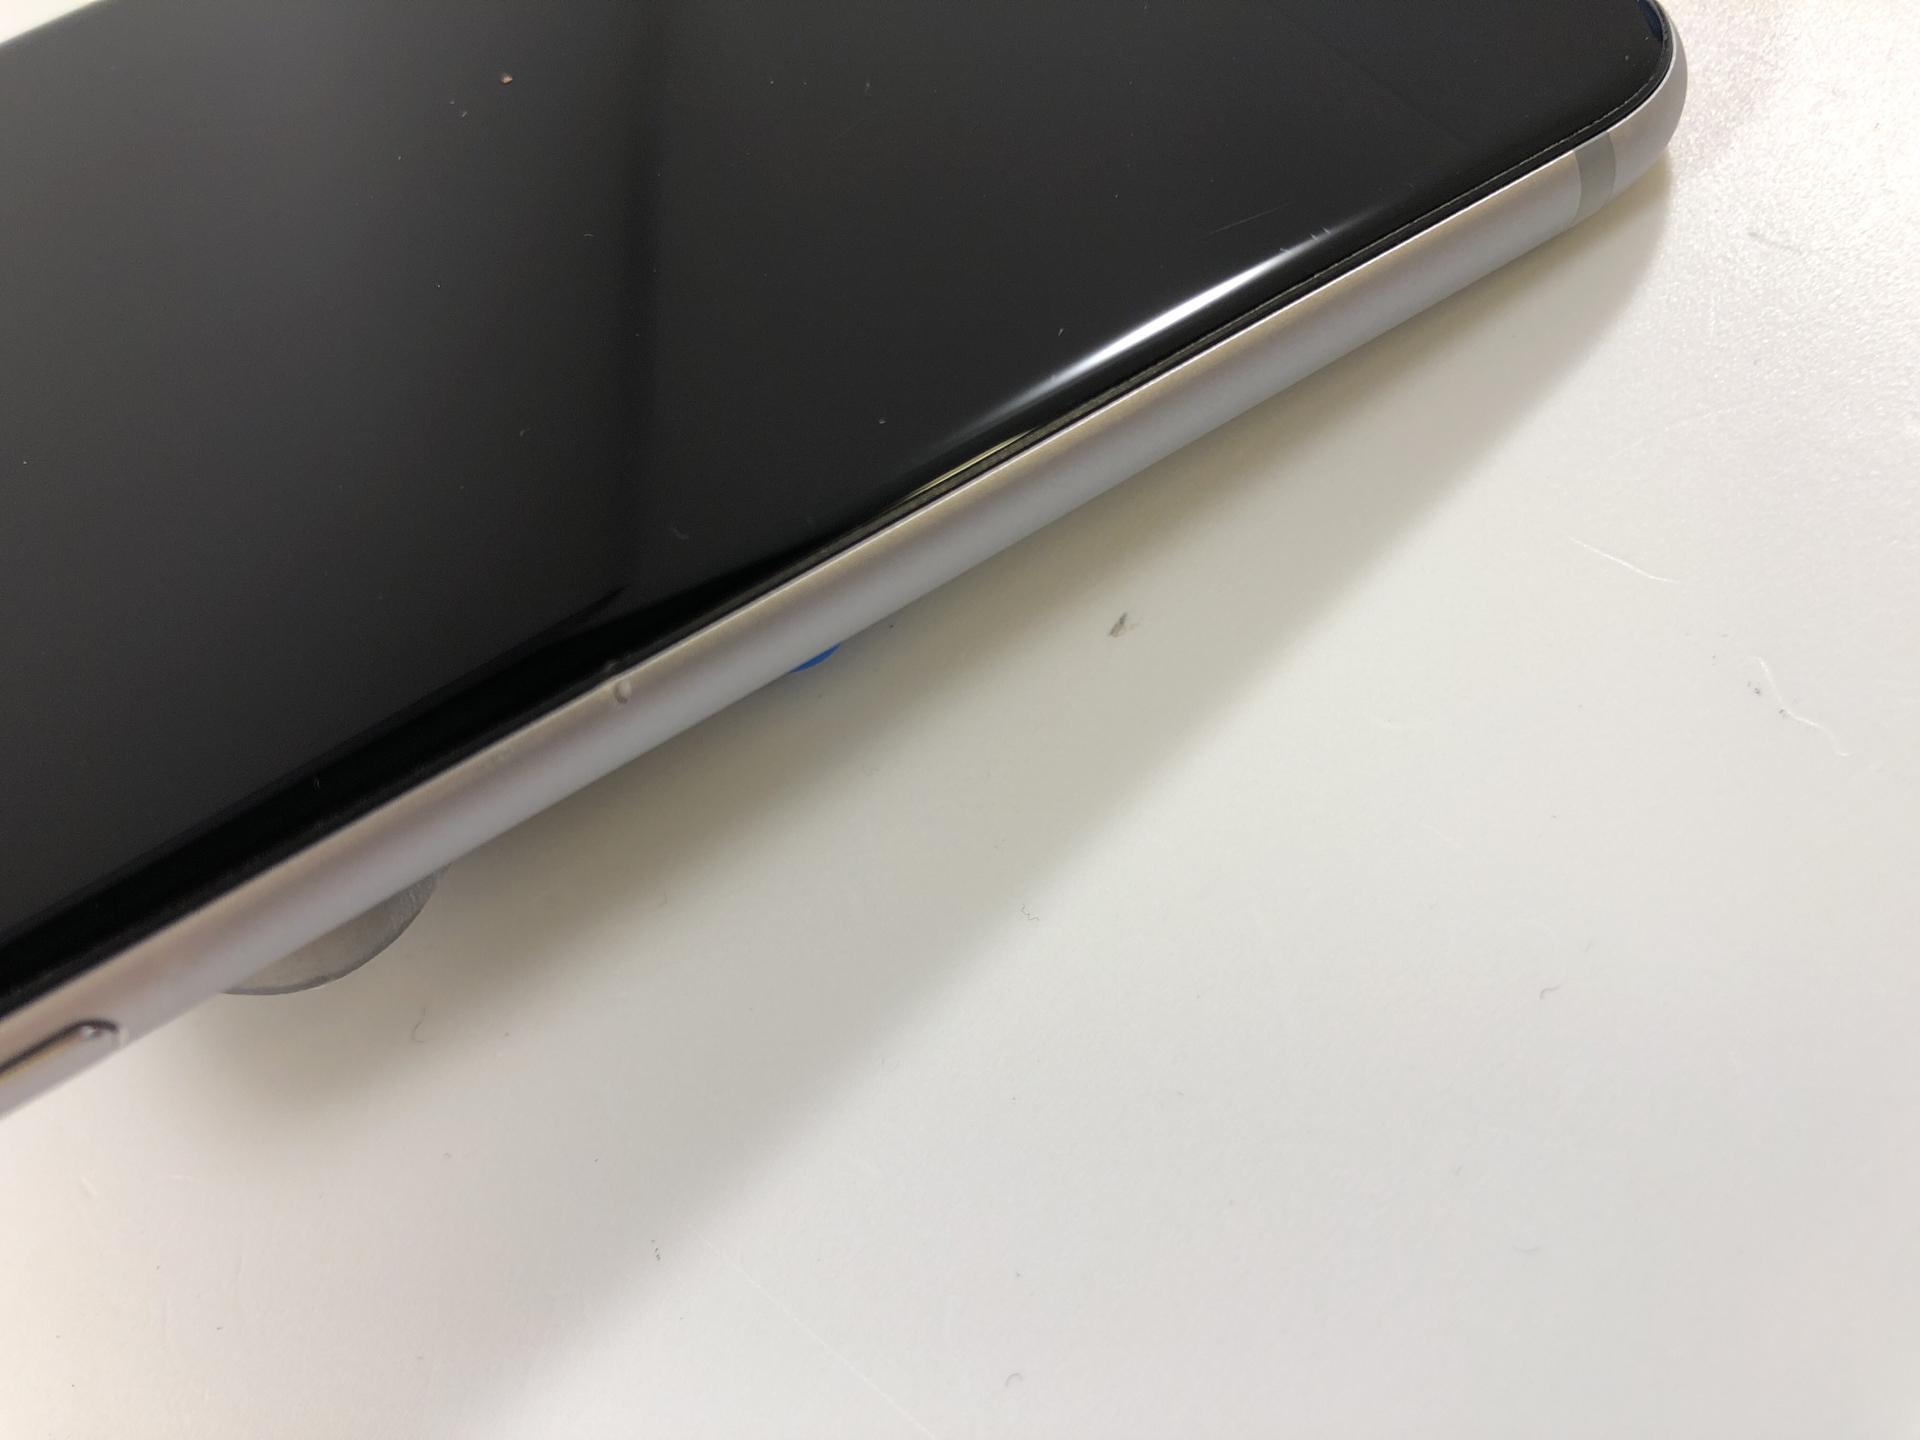 iPhone 6 16GB, 16GB, Space Gray, bild 4